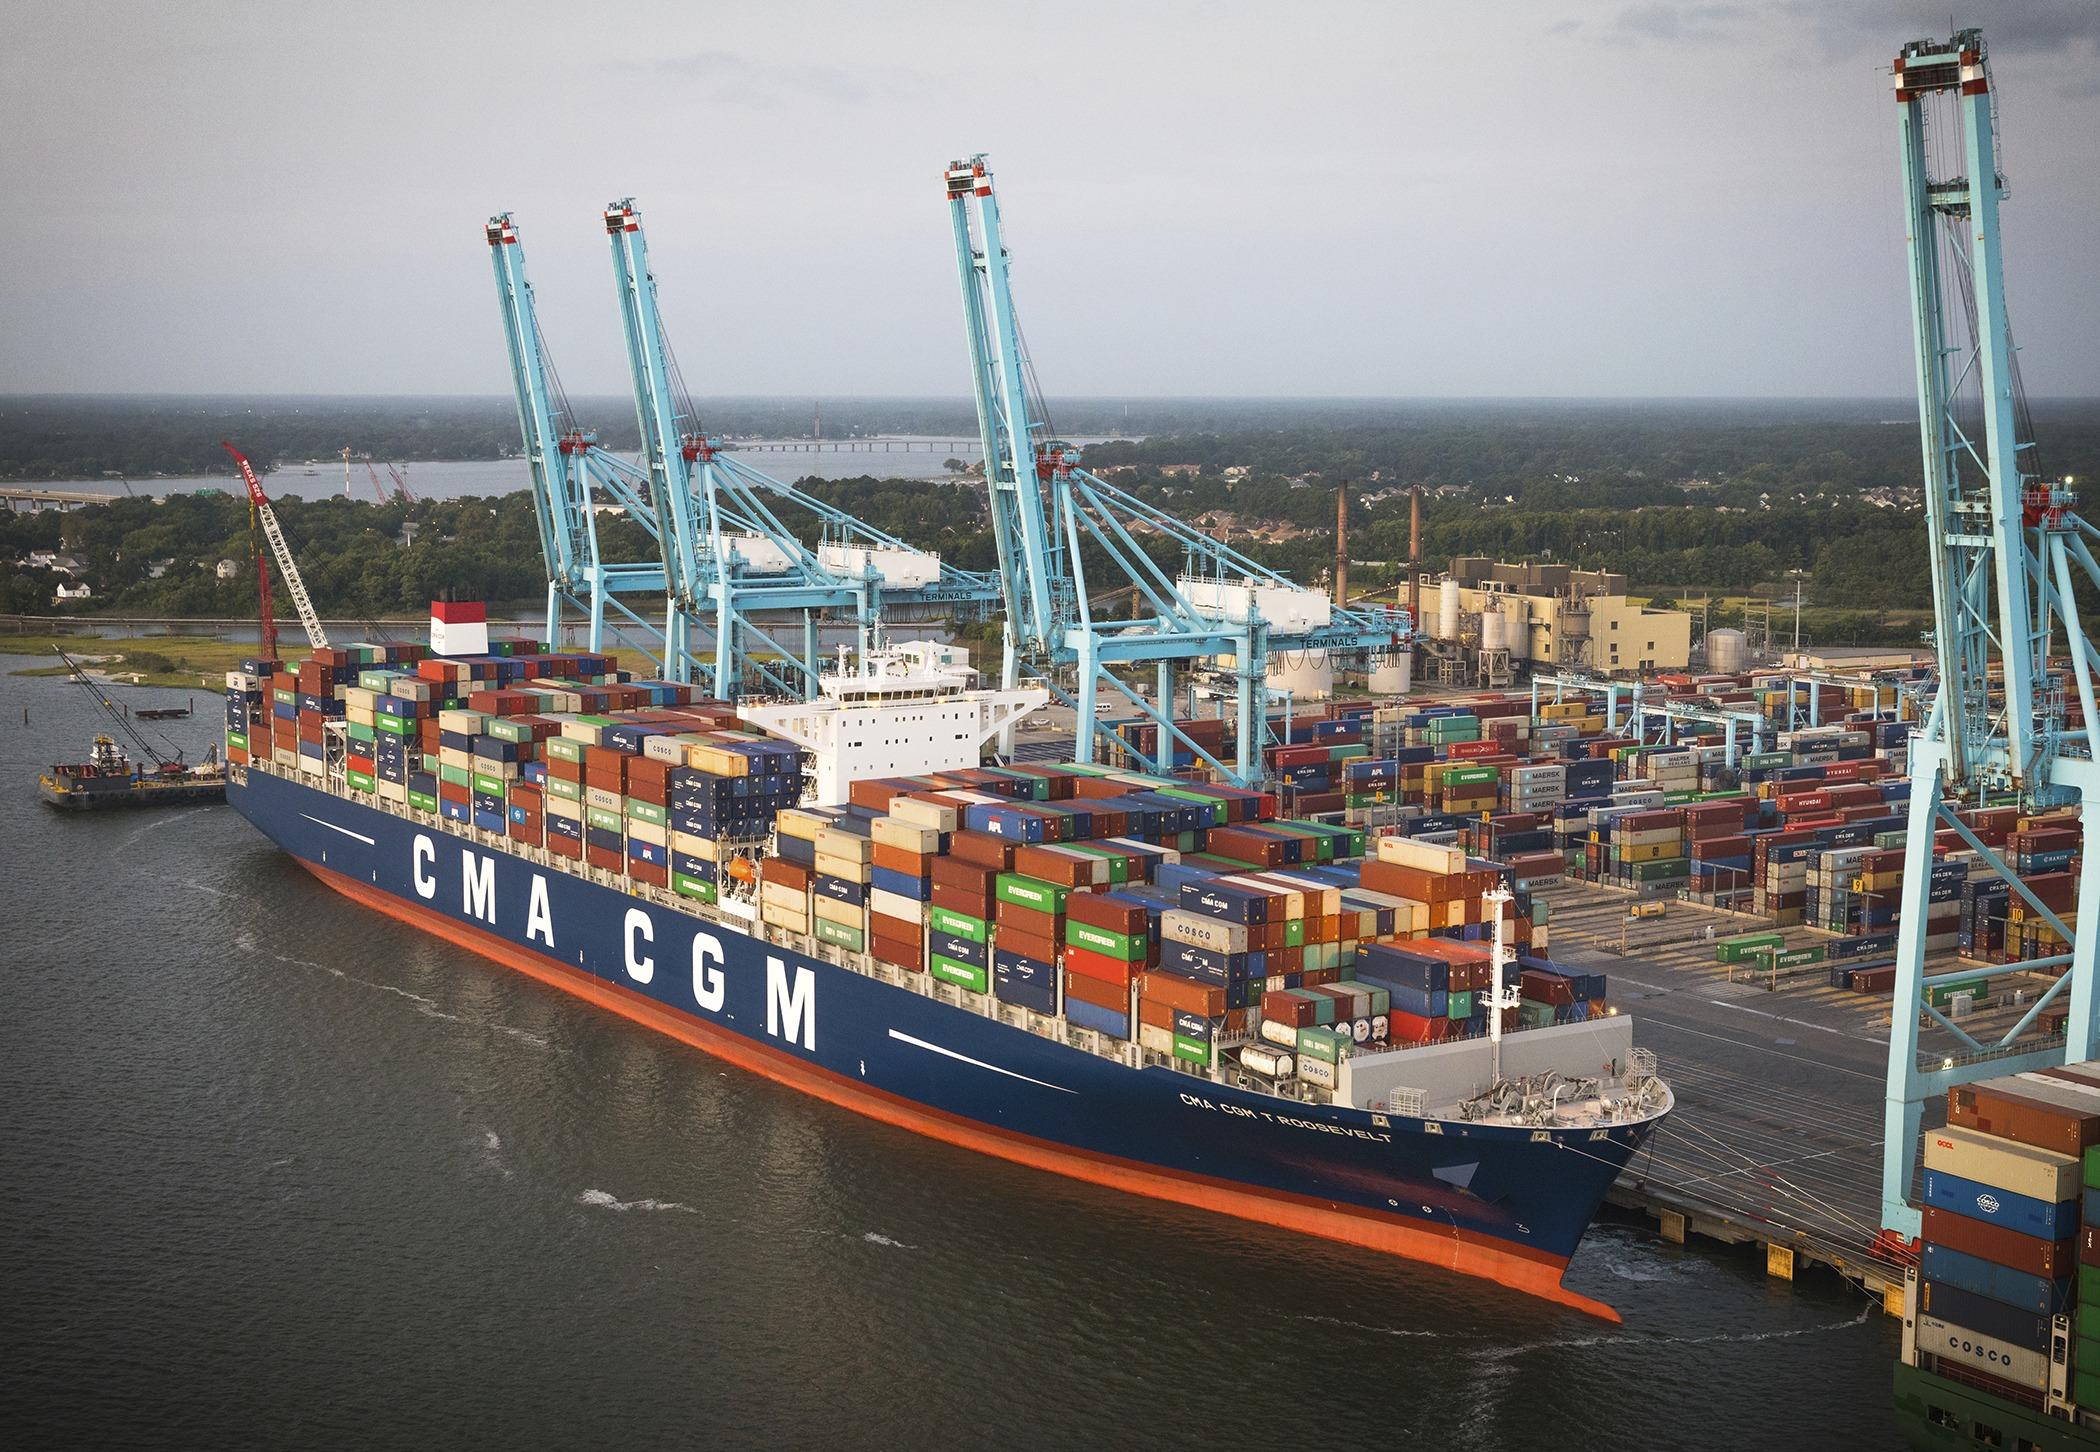 Lucsa Cargo Transporte Marítimo